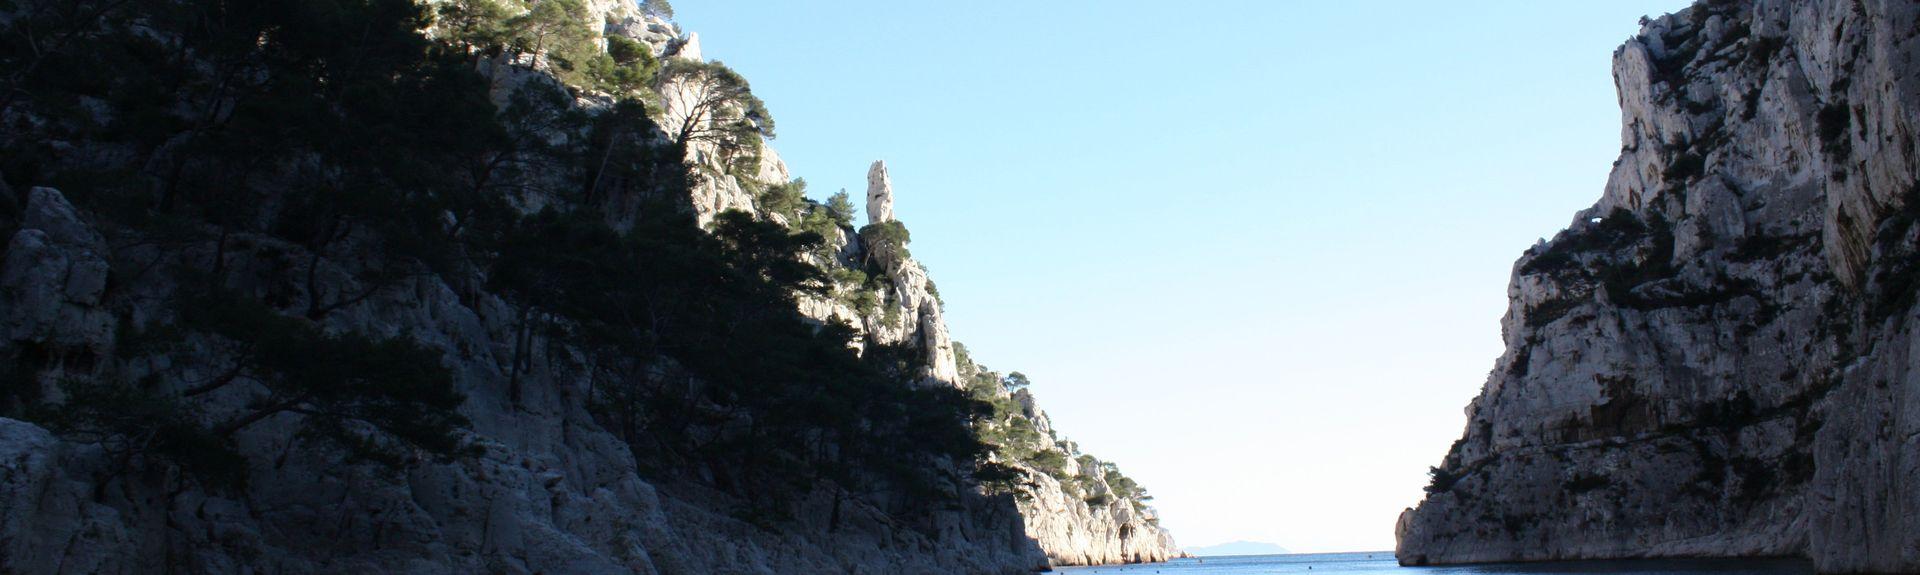 Vauban, Marseille, Bouches-du-Rhone (departementti), Ranska